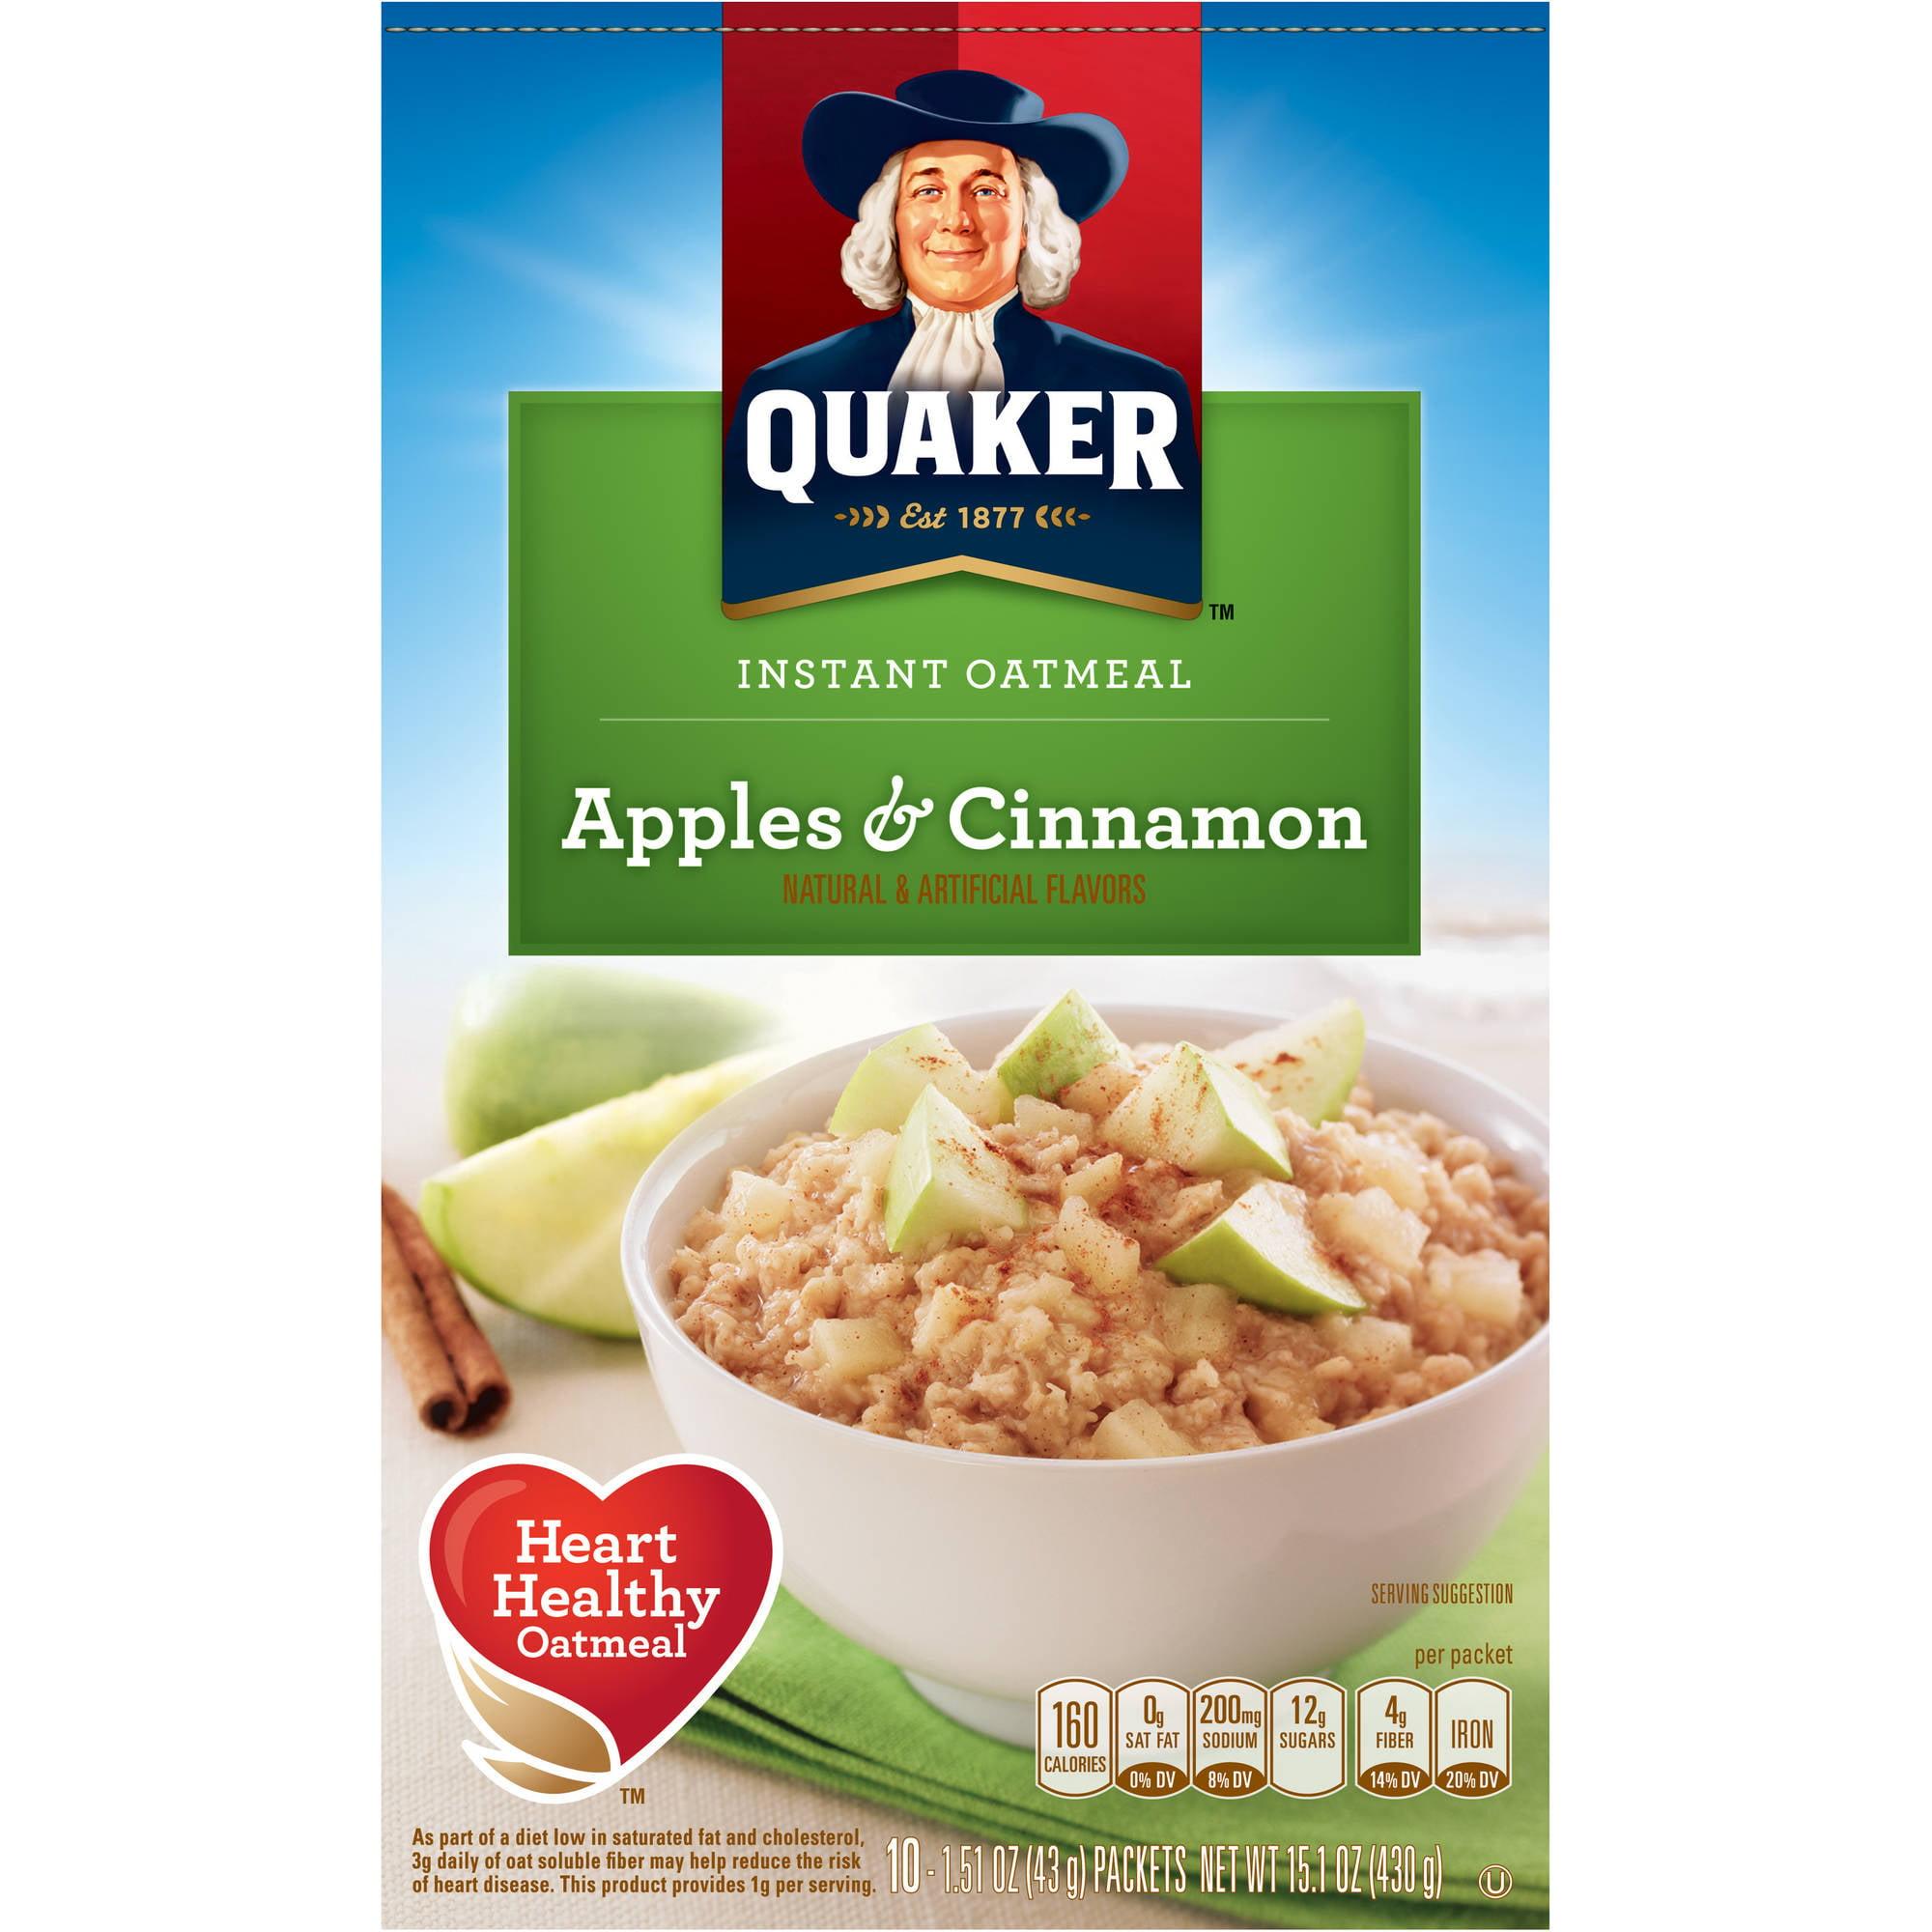 Quaker Apples & Cinnamon Instant Oatmeal, 1.51 oz, 10 count